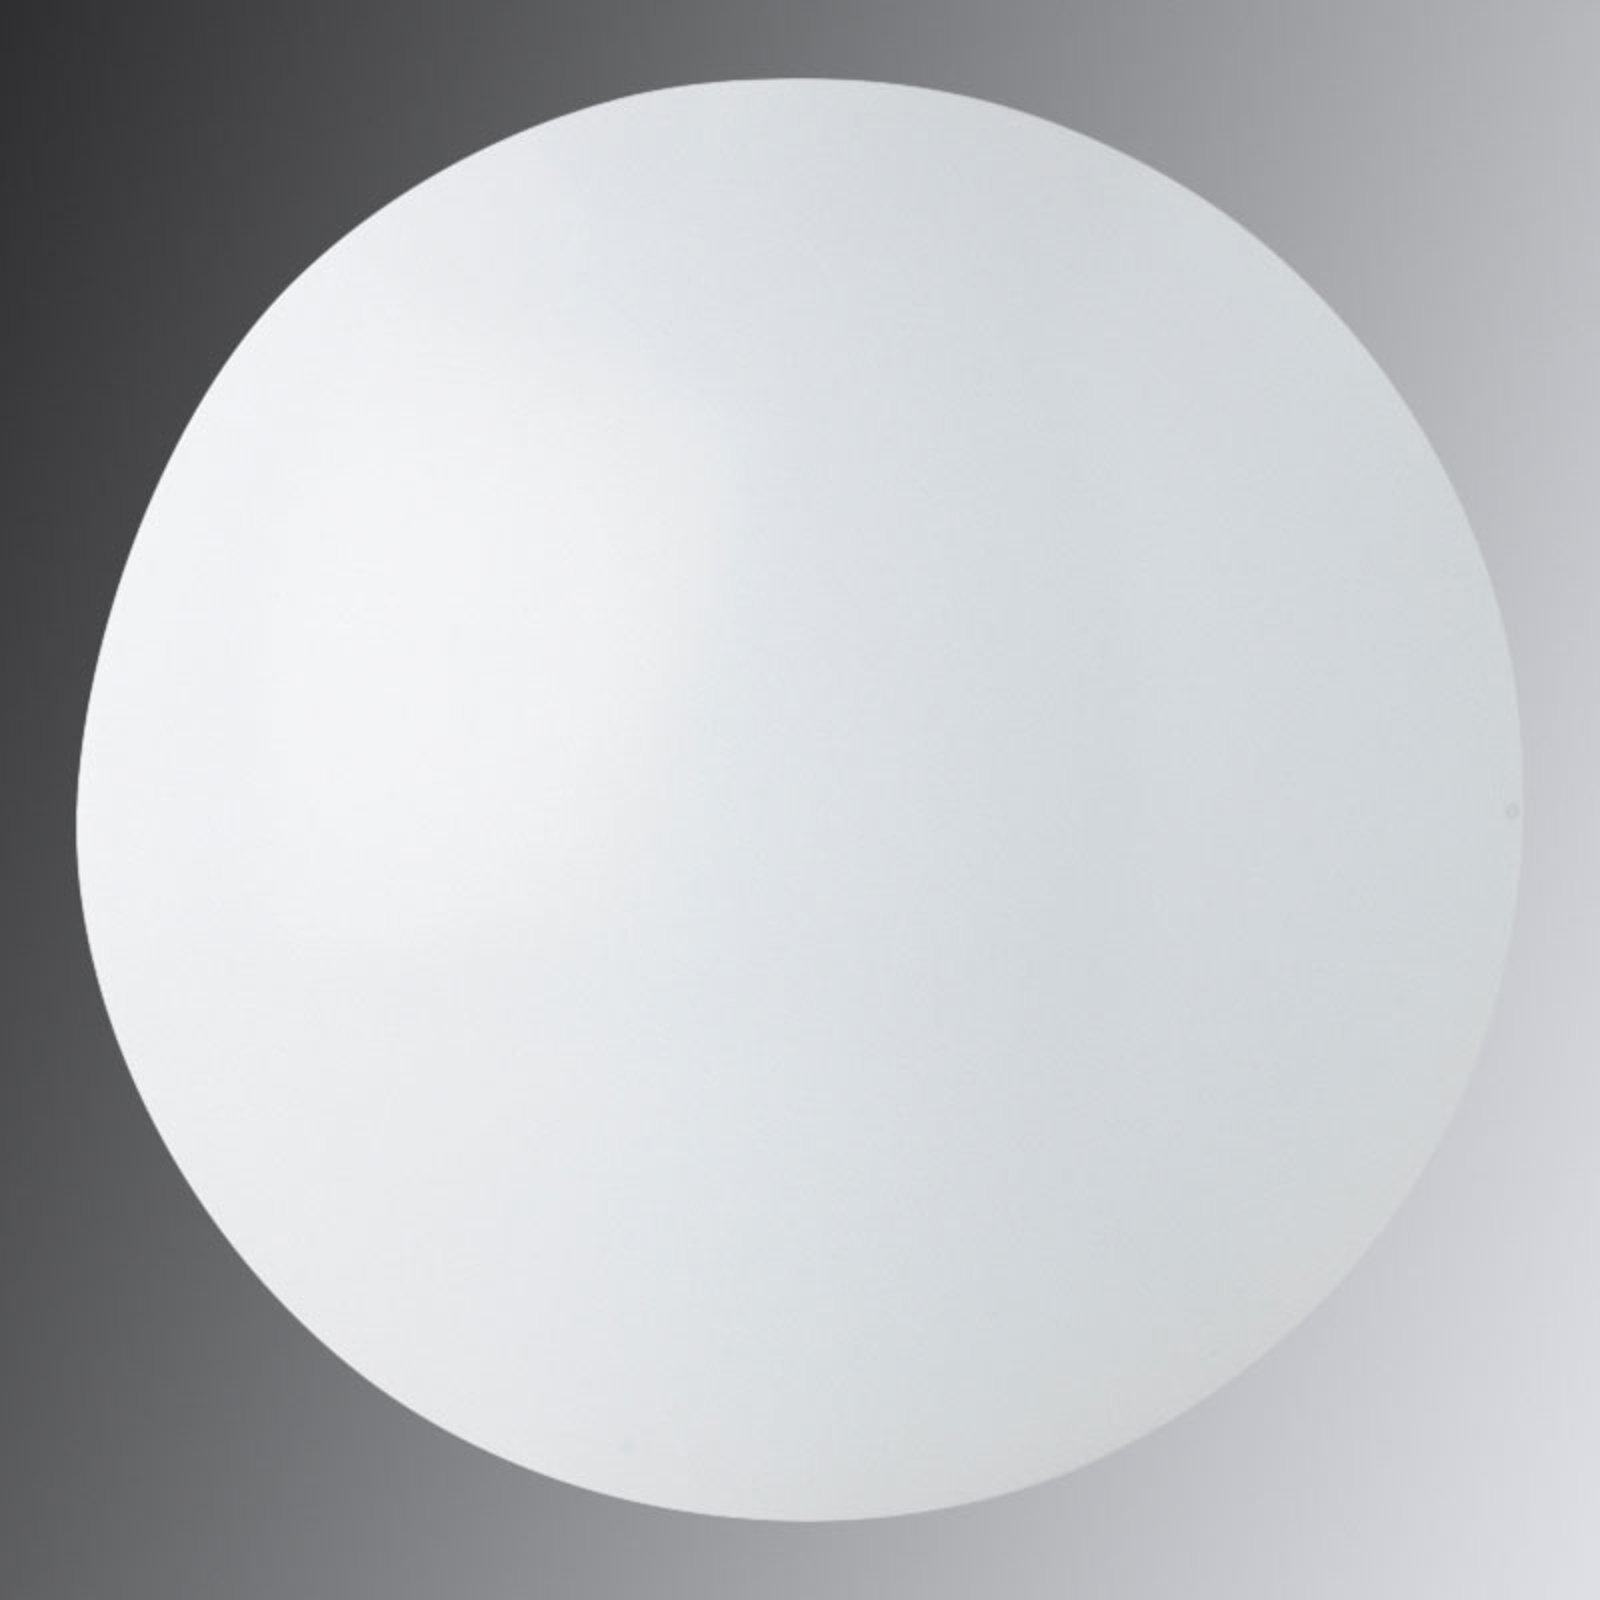 Renzo lys LED-taklampe,31,5 W, 3 000 K